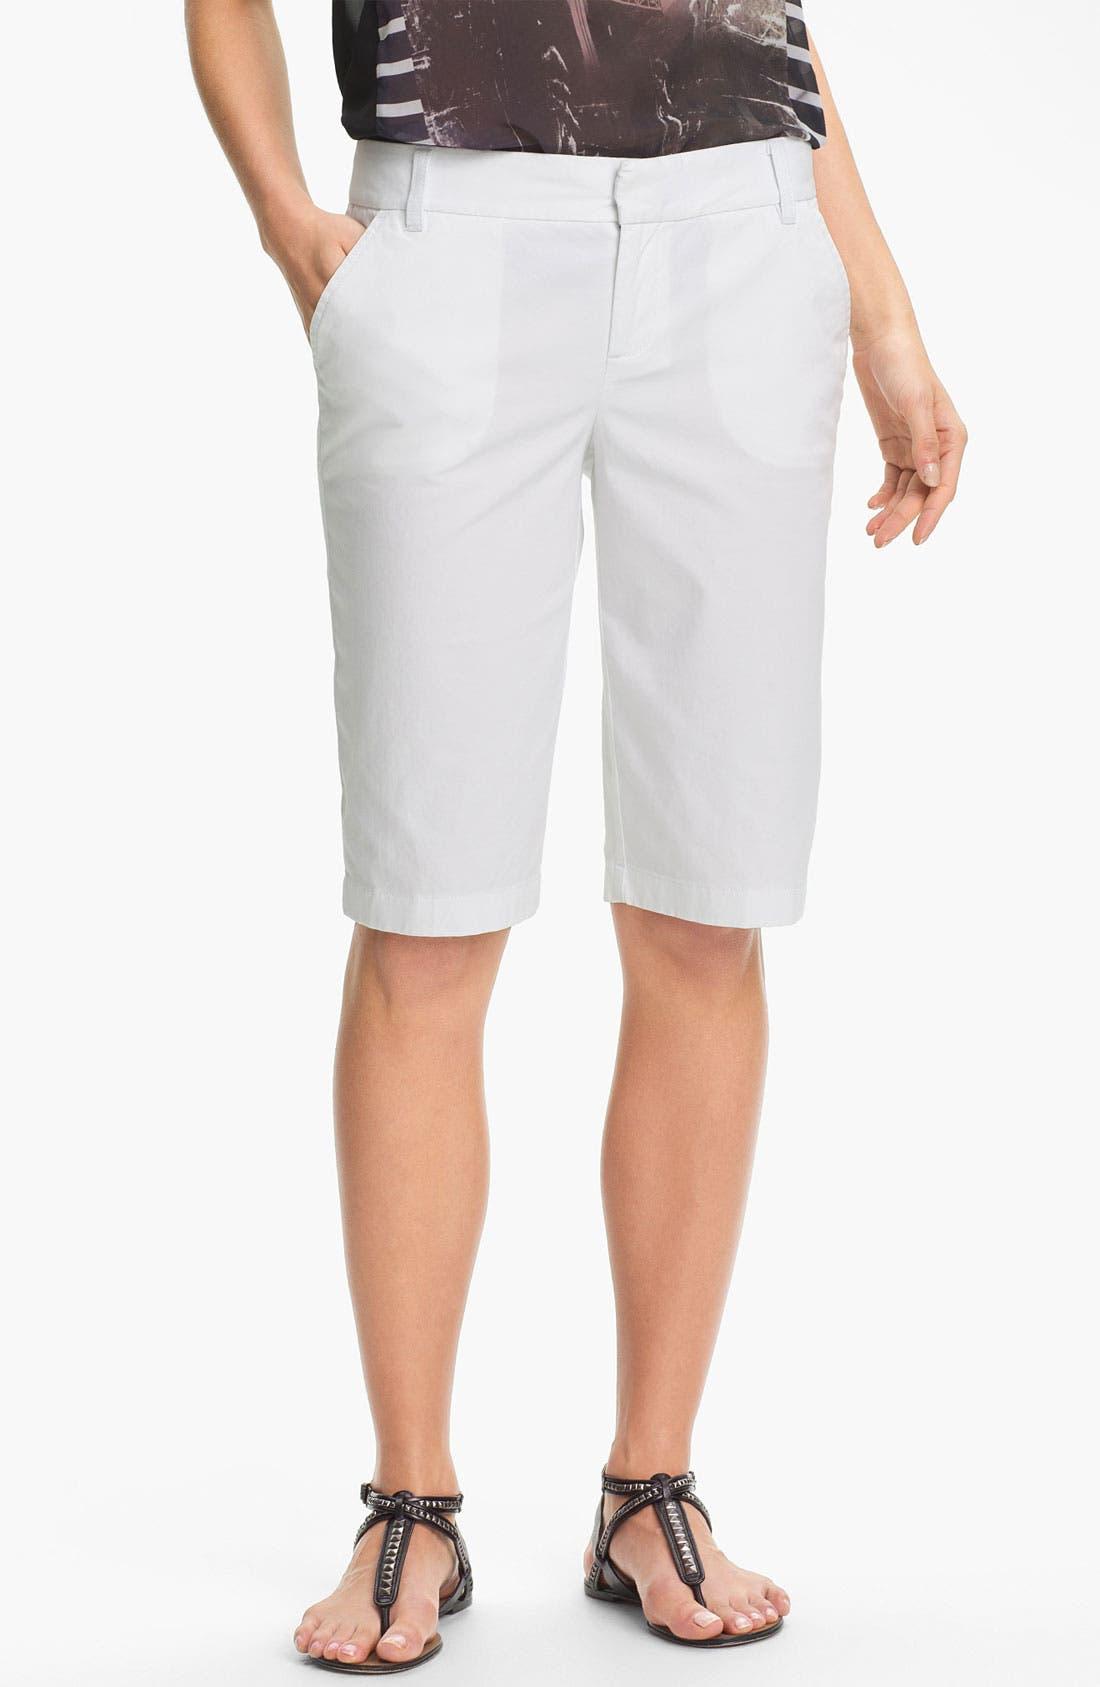 Alternate Image 1 Selected - Caslon® Twill Bermuda Shorts (Regular & Petite)